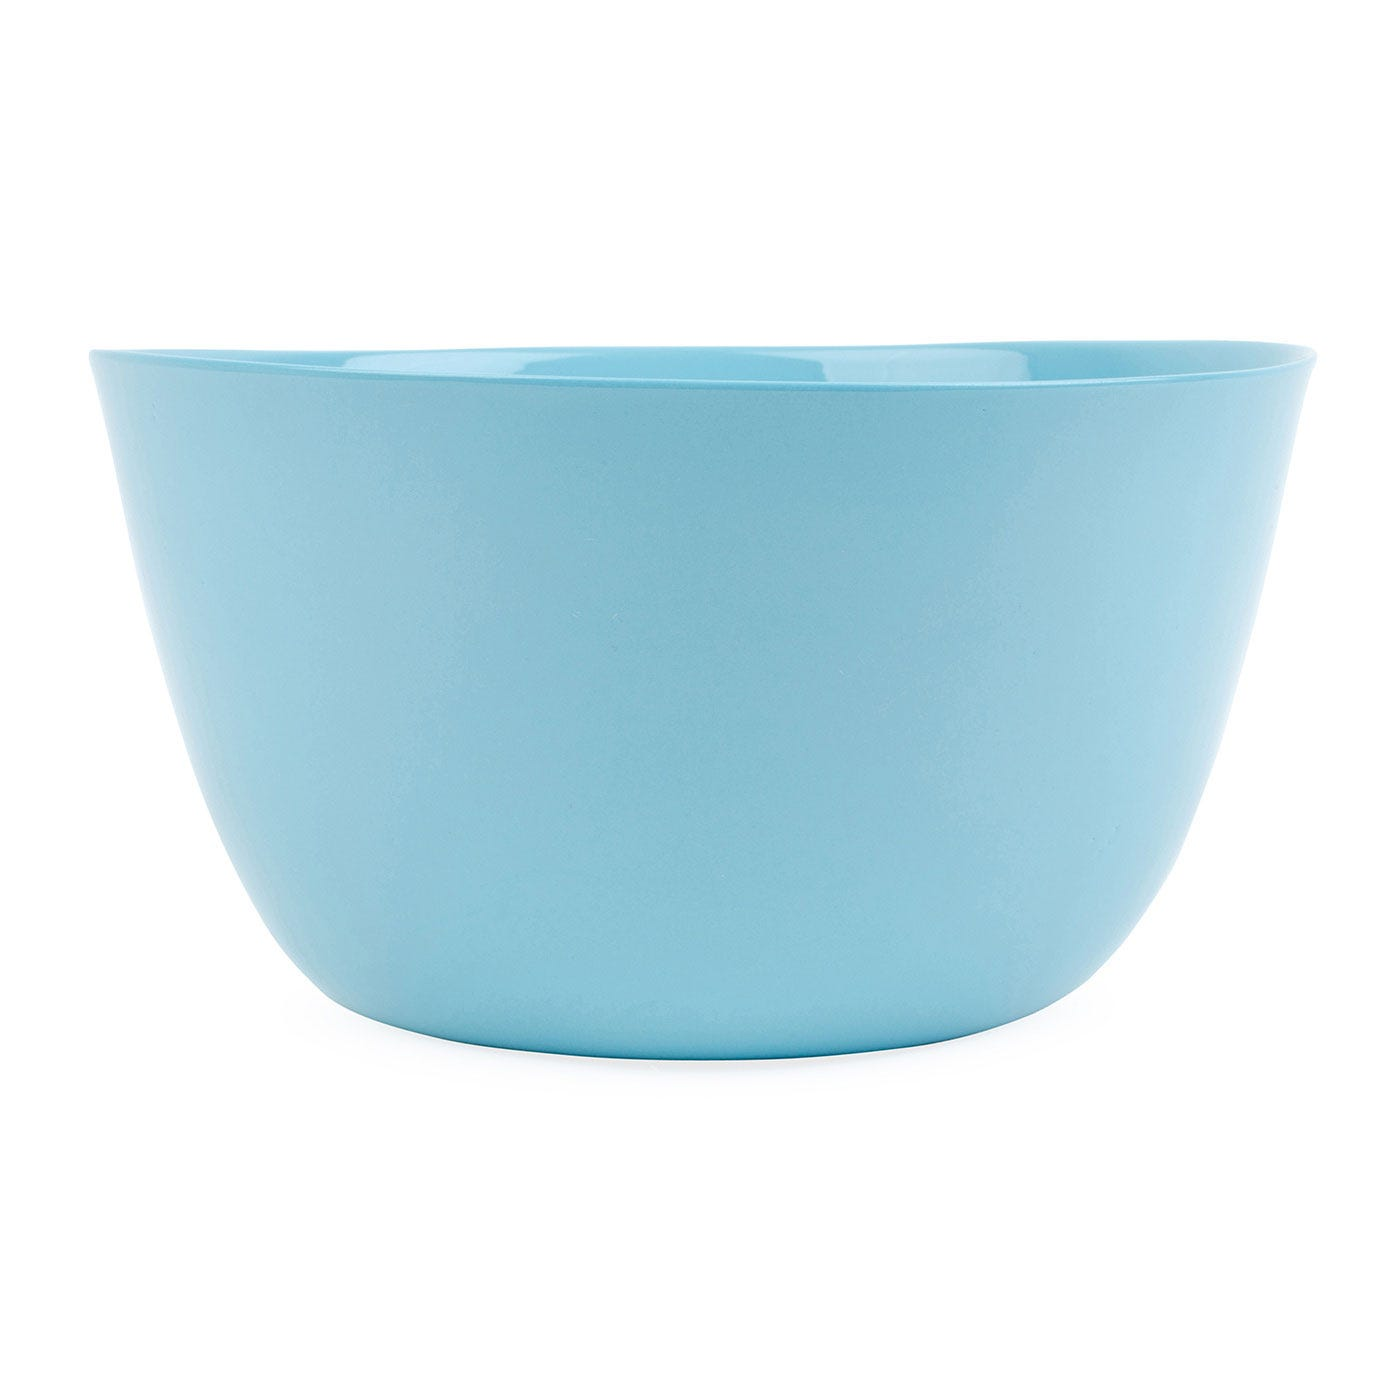 Porcelain Turquoise Salad Bowl